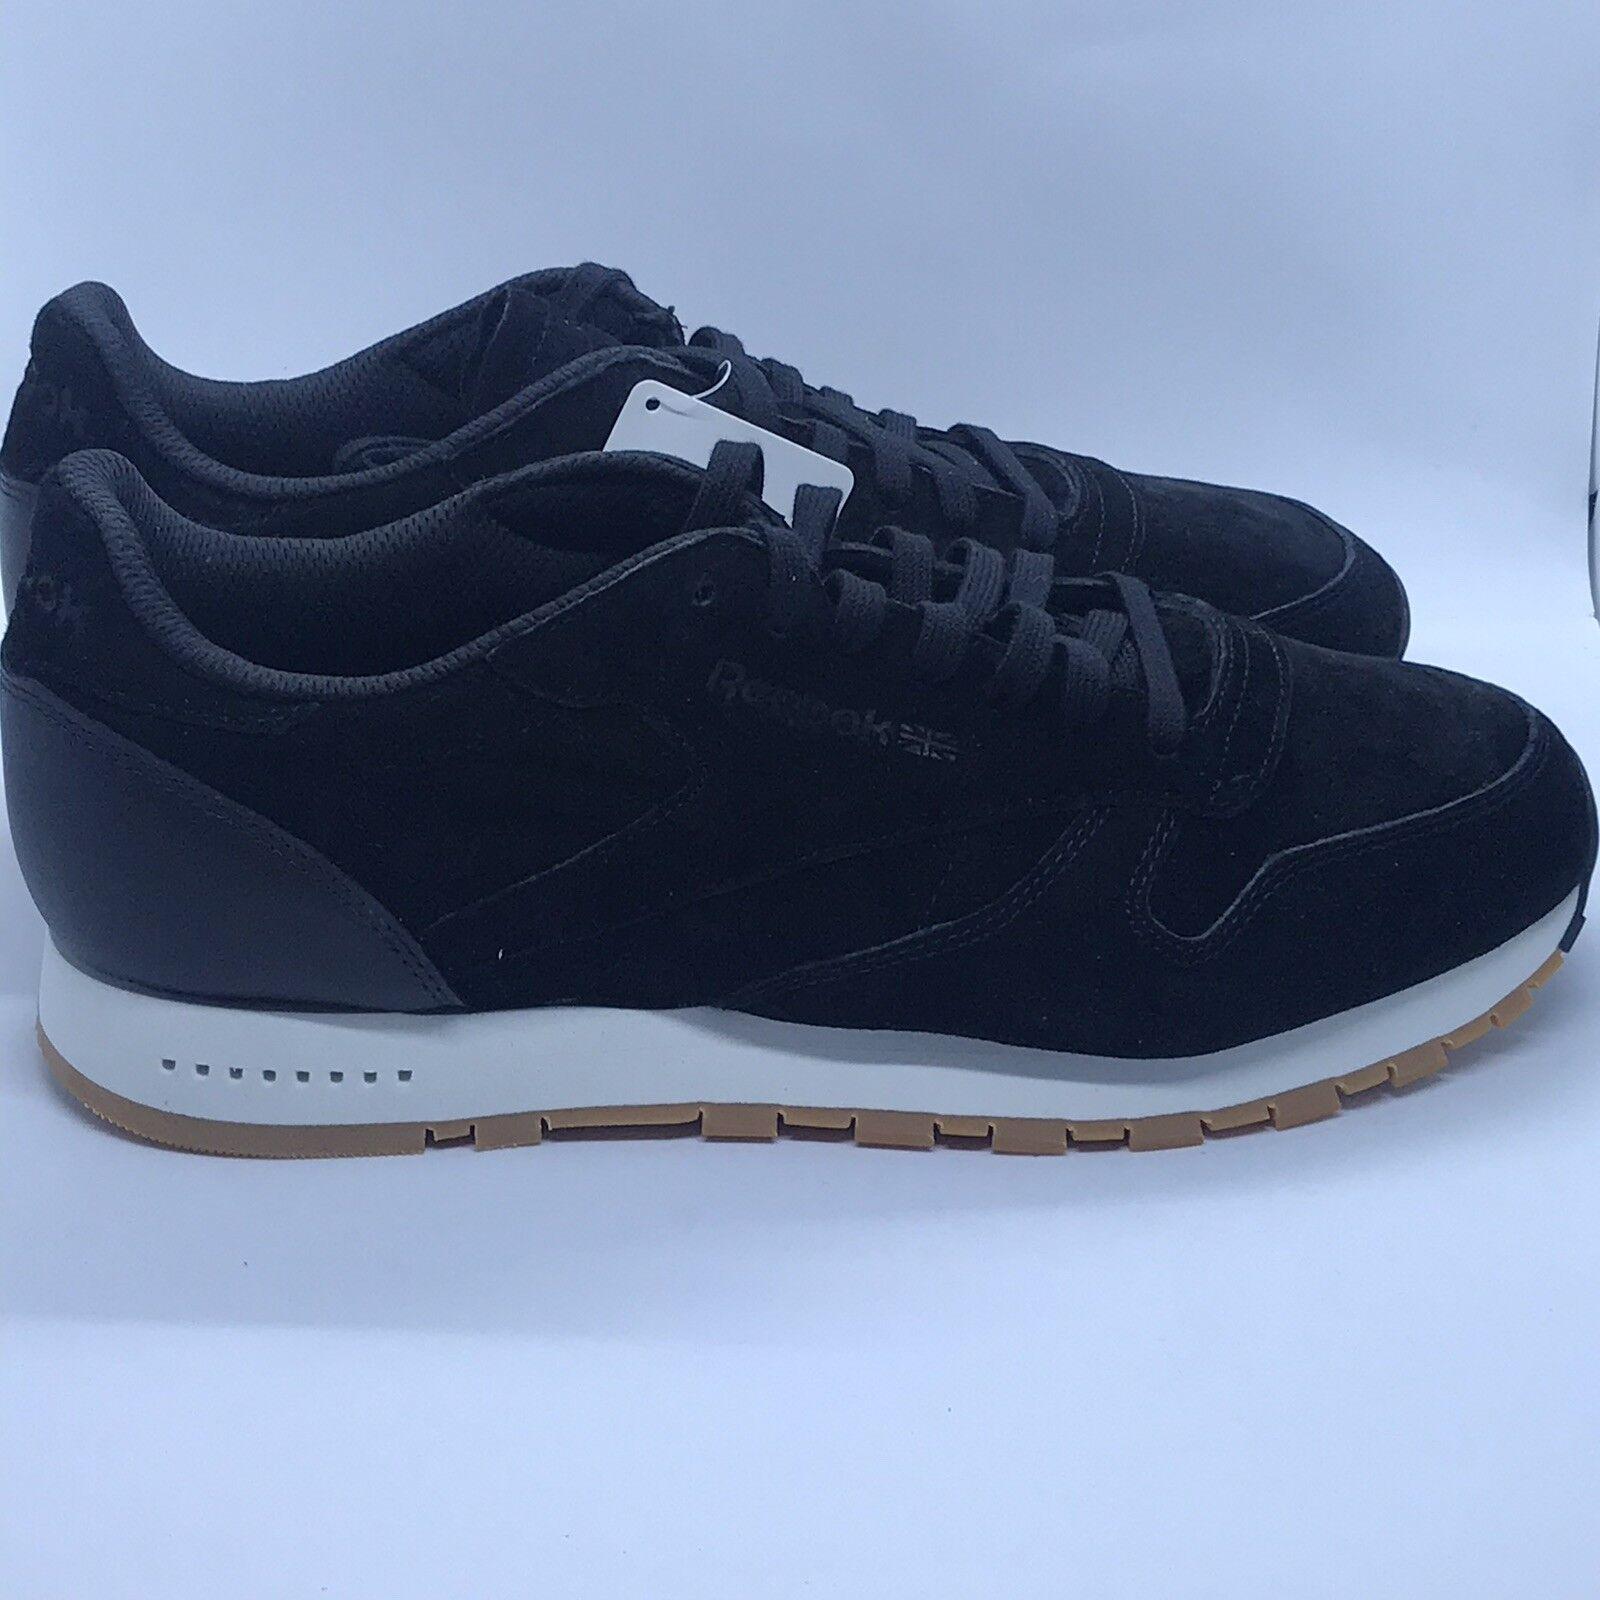 uomo REEBOK CLASSIC CL LEATHER SG nero CHALK-GUM CHALK-GUM CHALK-GUM  scarpe Dimensione 11.5 New 5eacfe